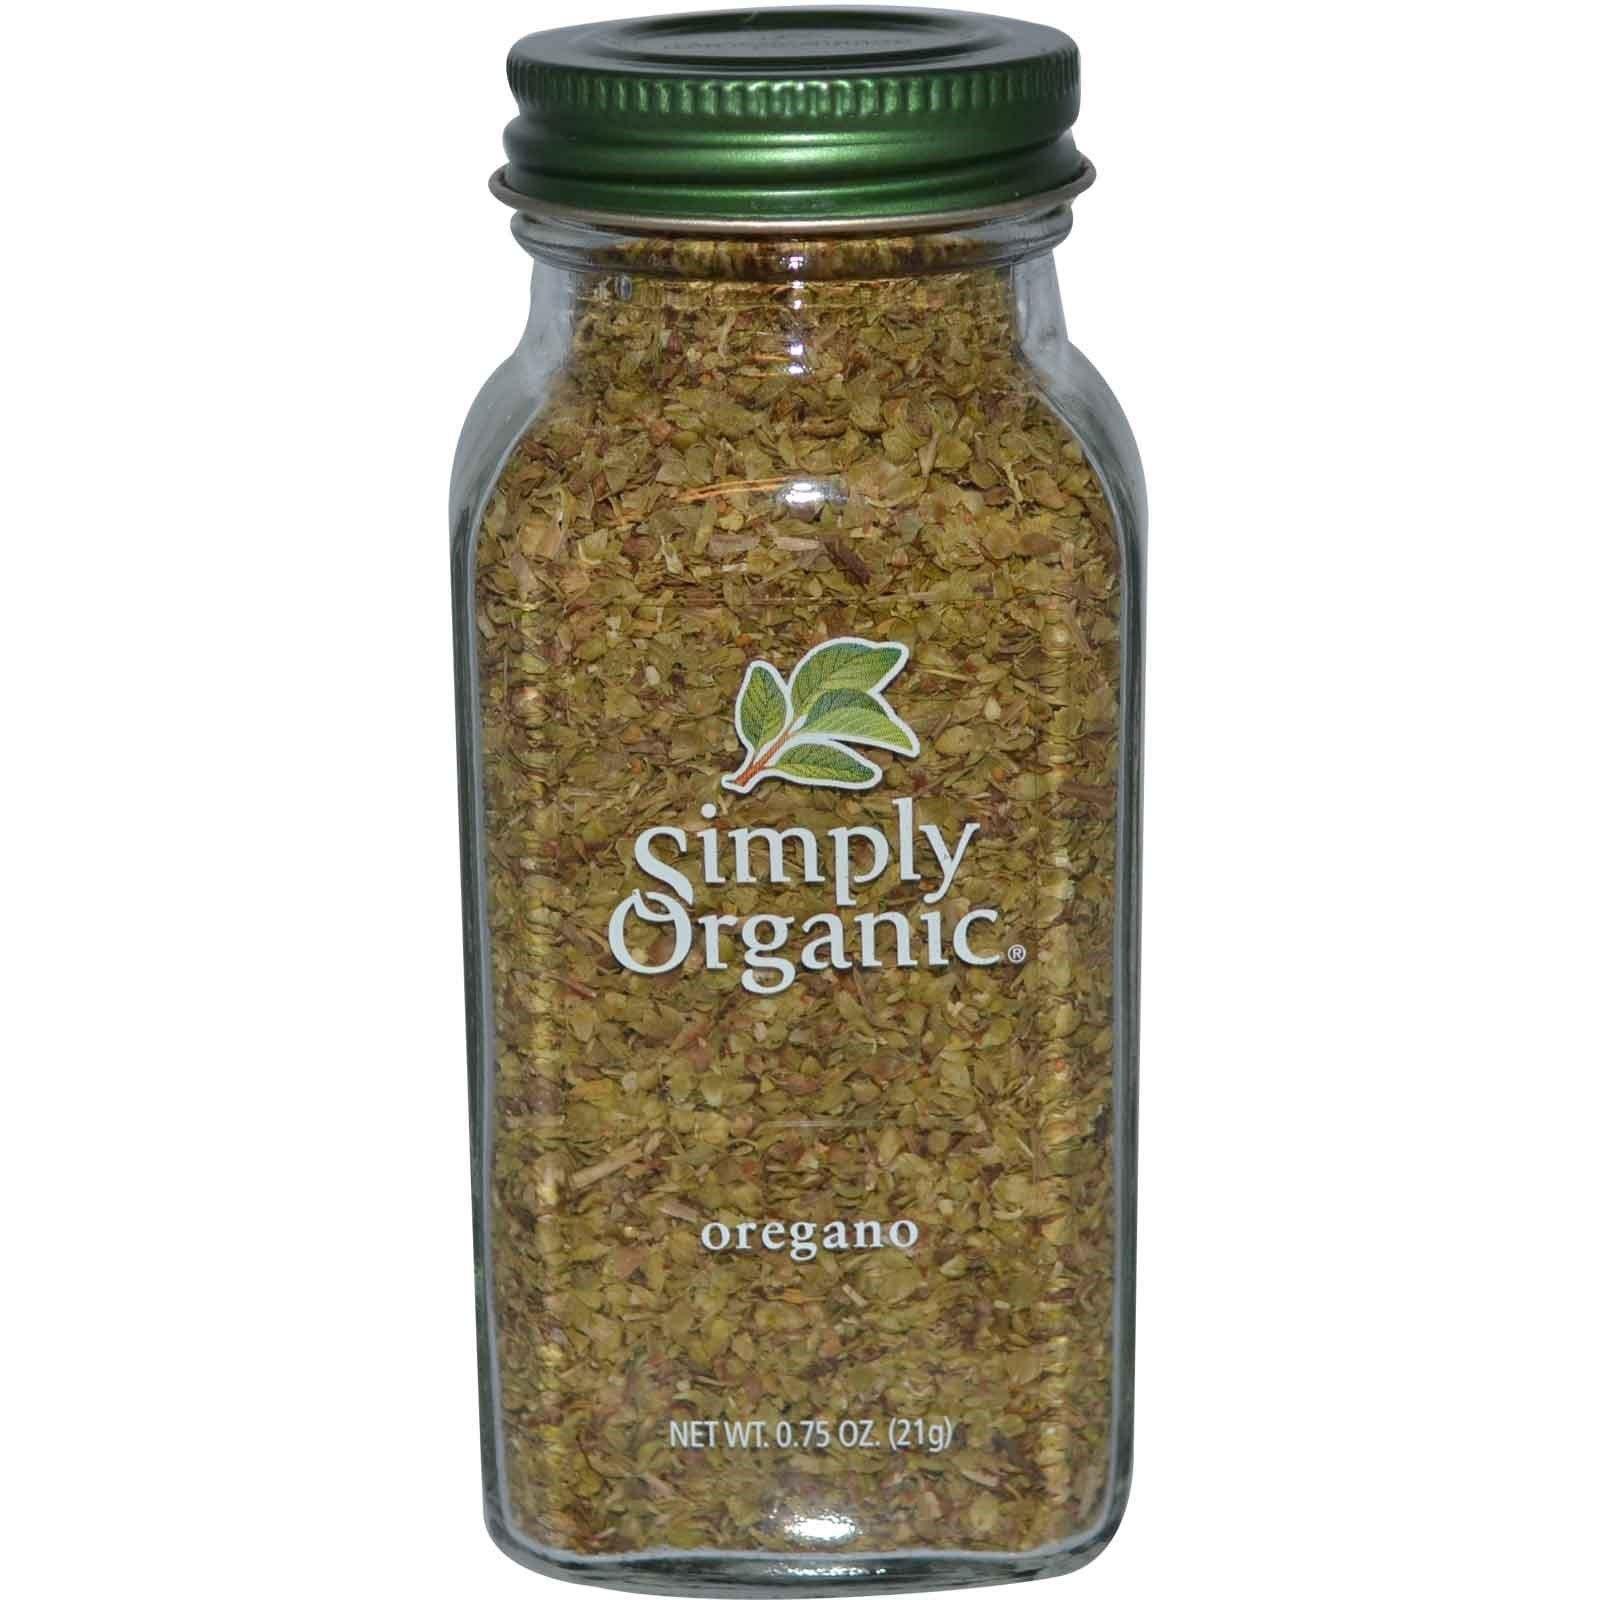 Simply Organic Ssnng Oregano Org Bttl by Simply Organic